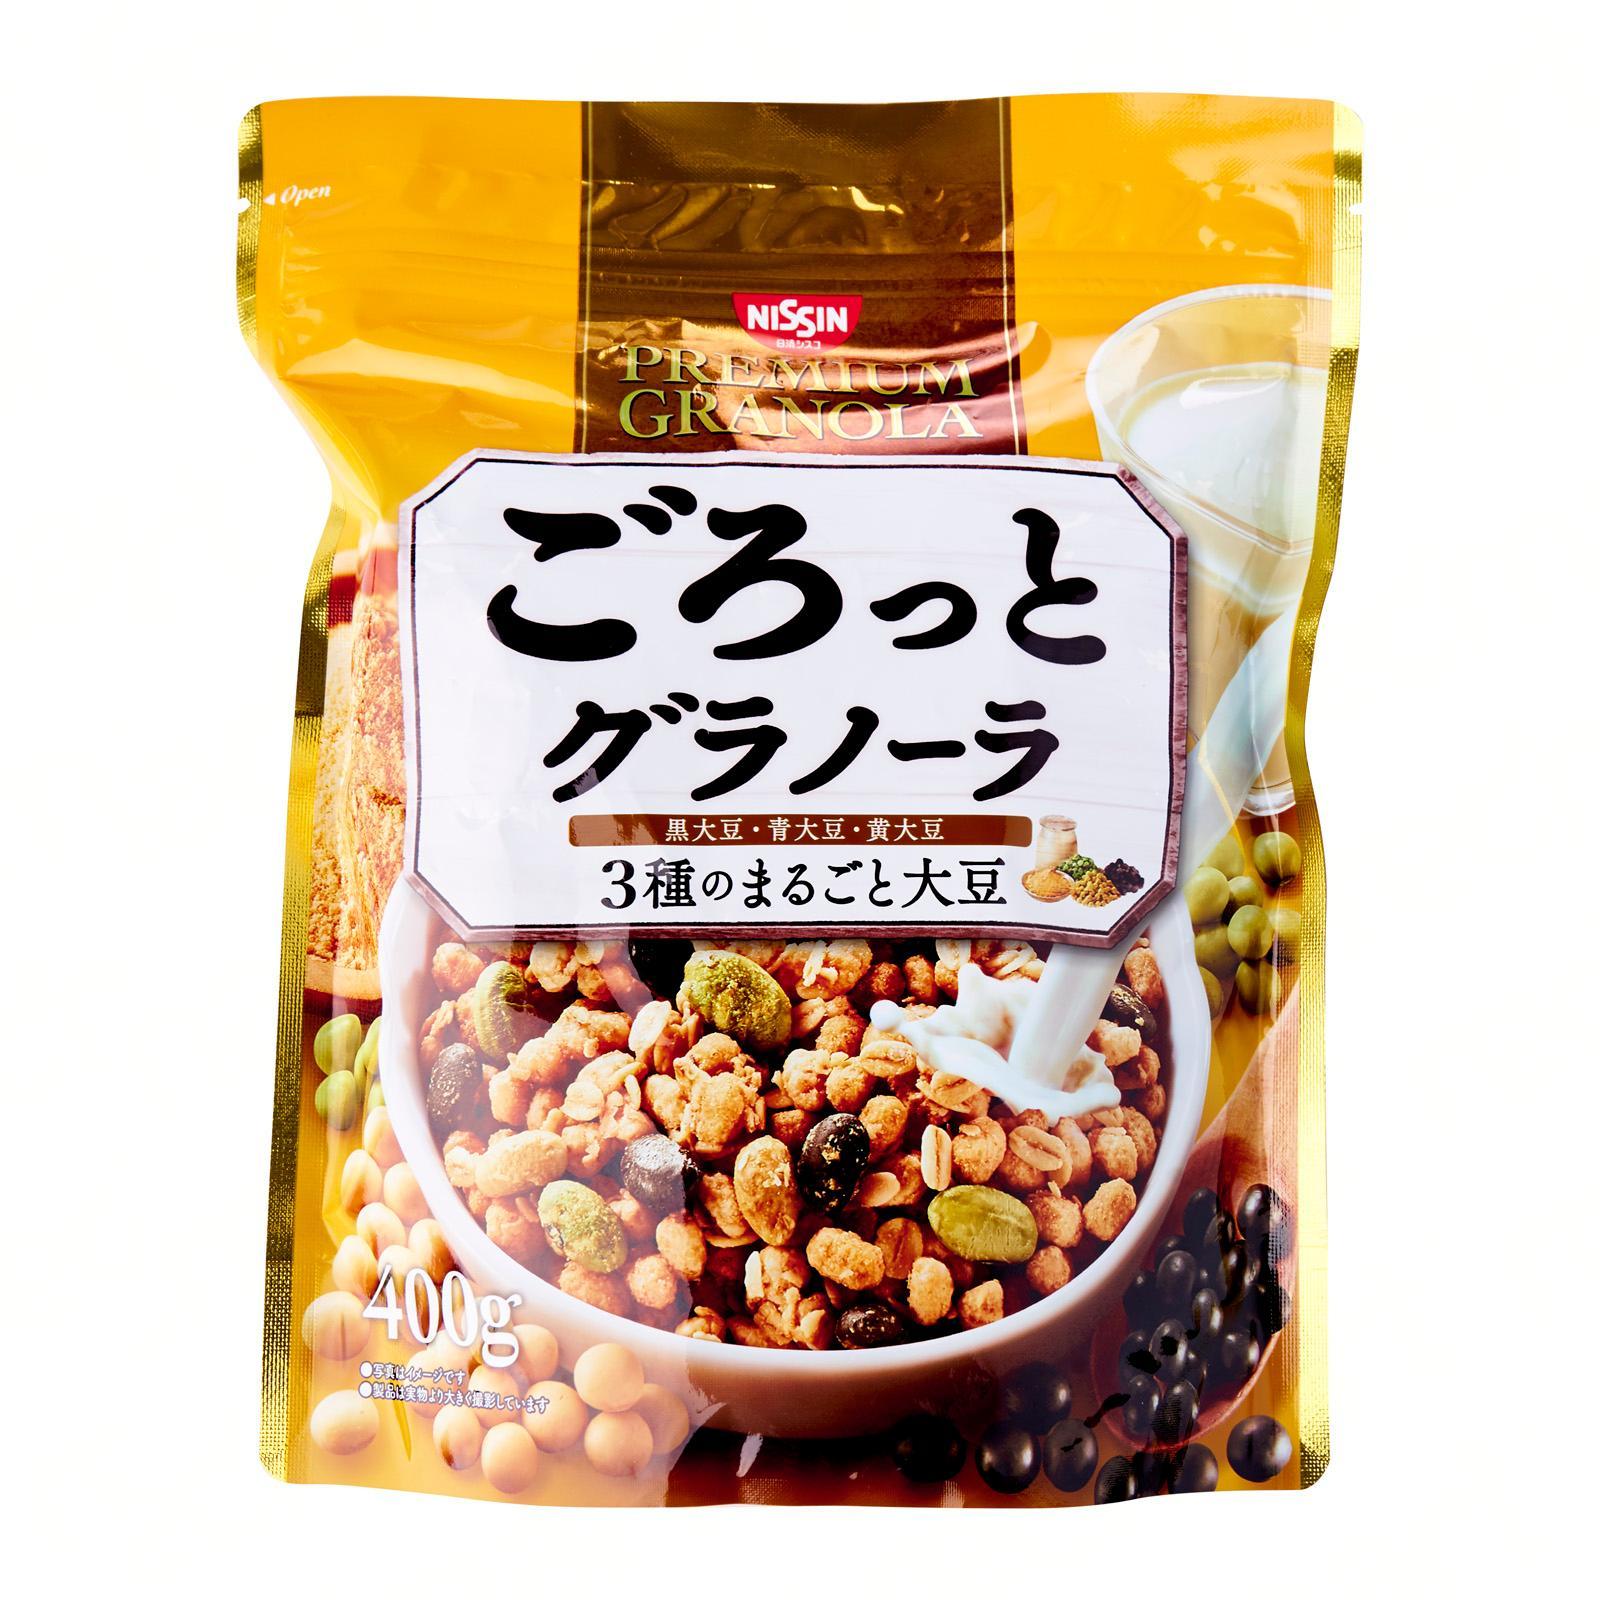 Nissin Gorotto 3 Kinds Of Soybean Breakfast Granola